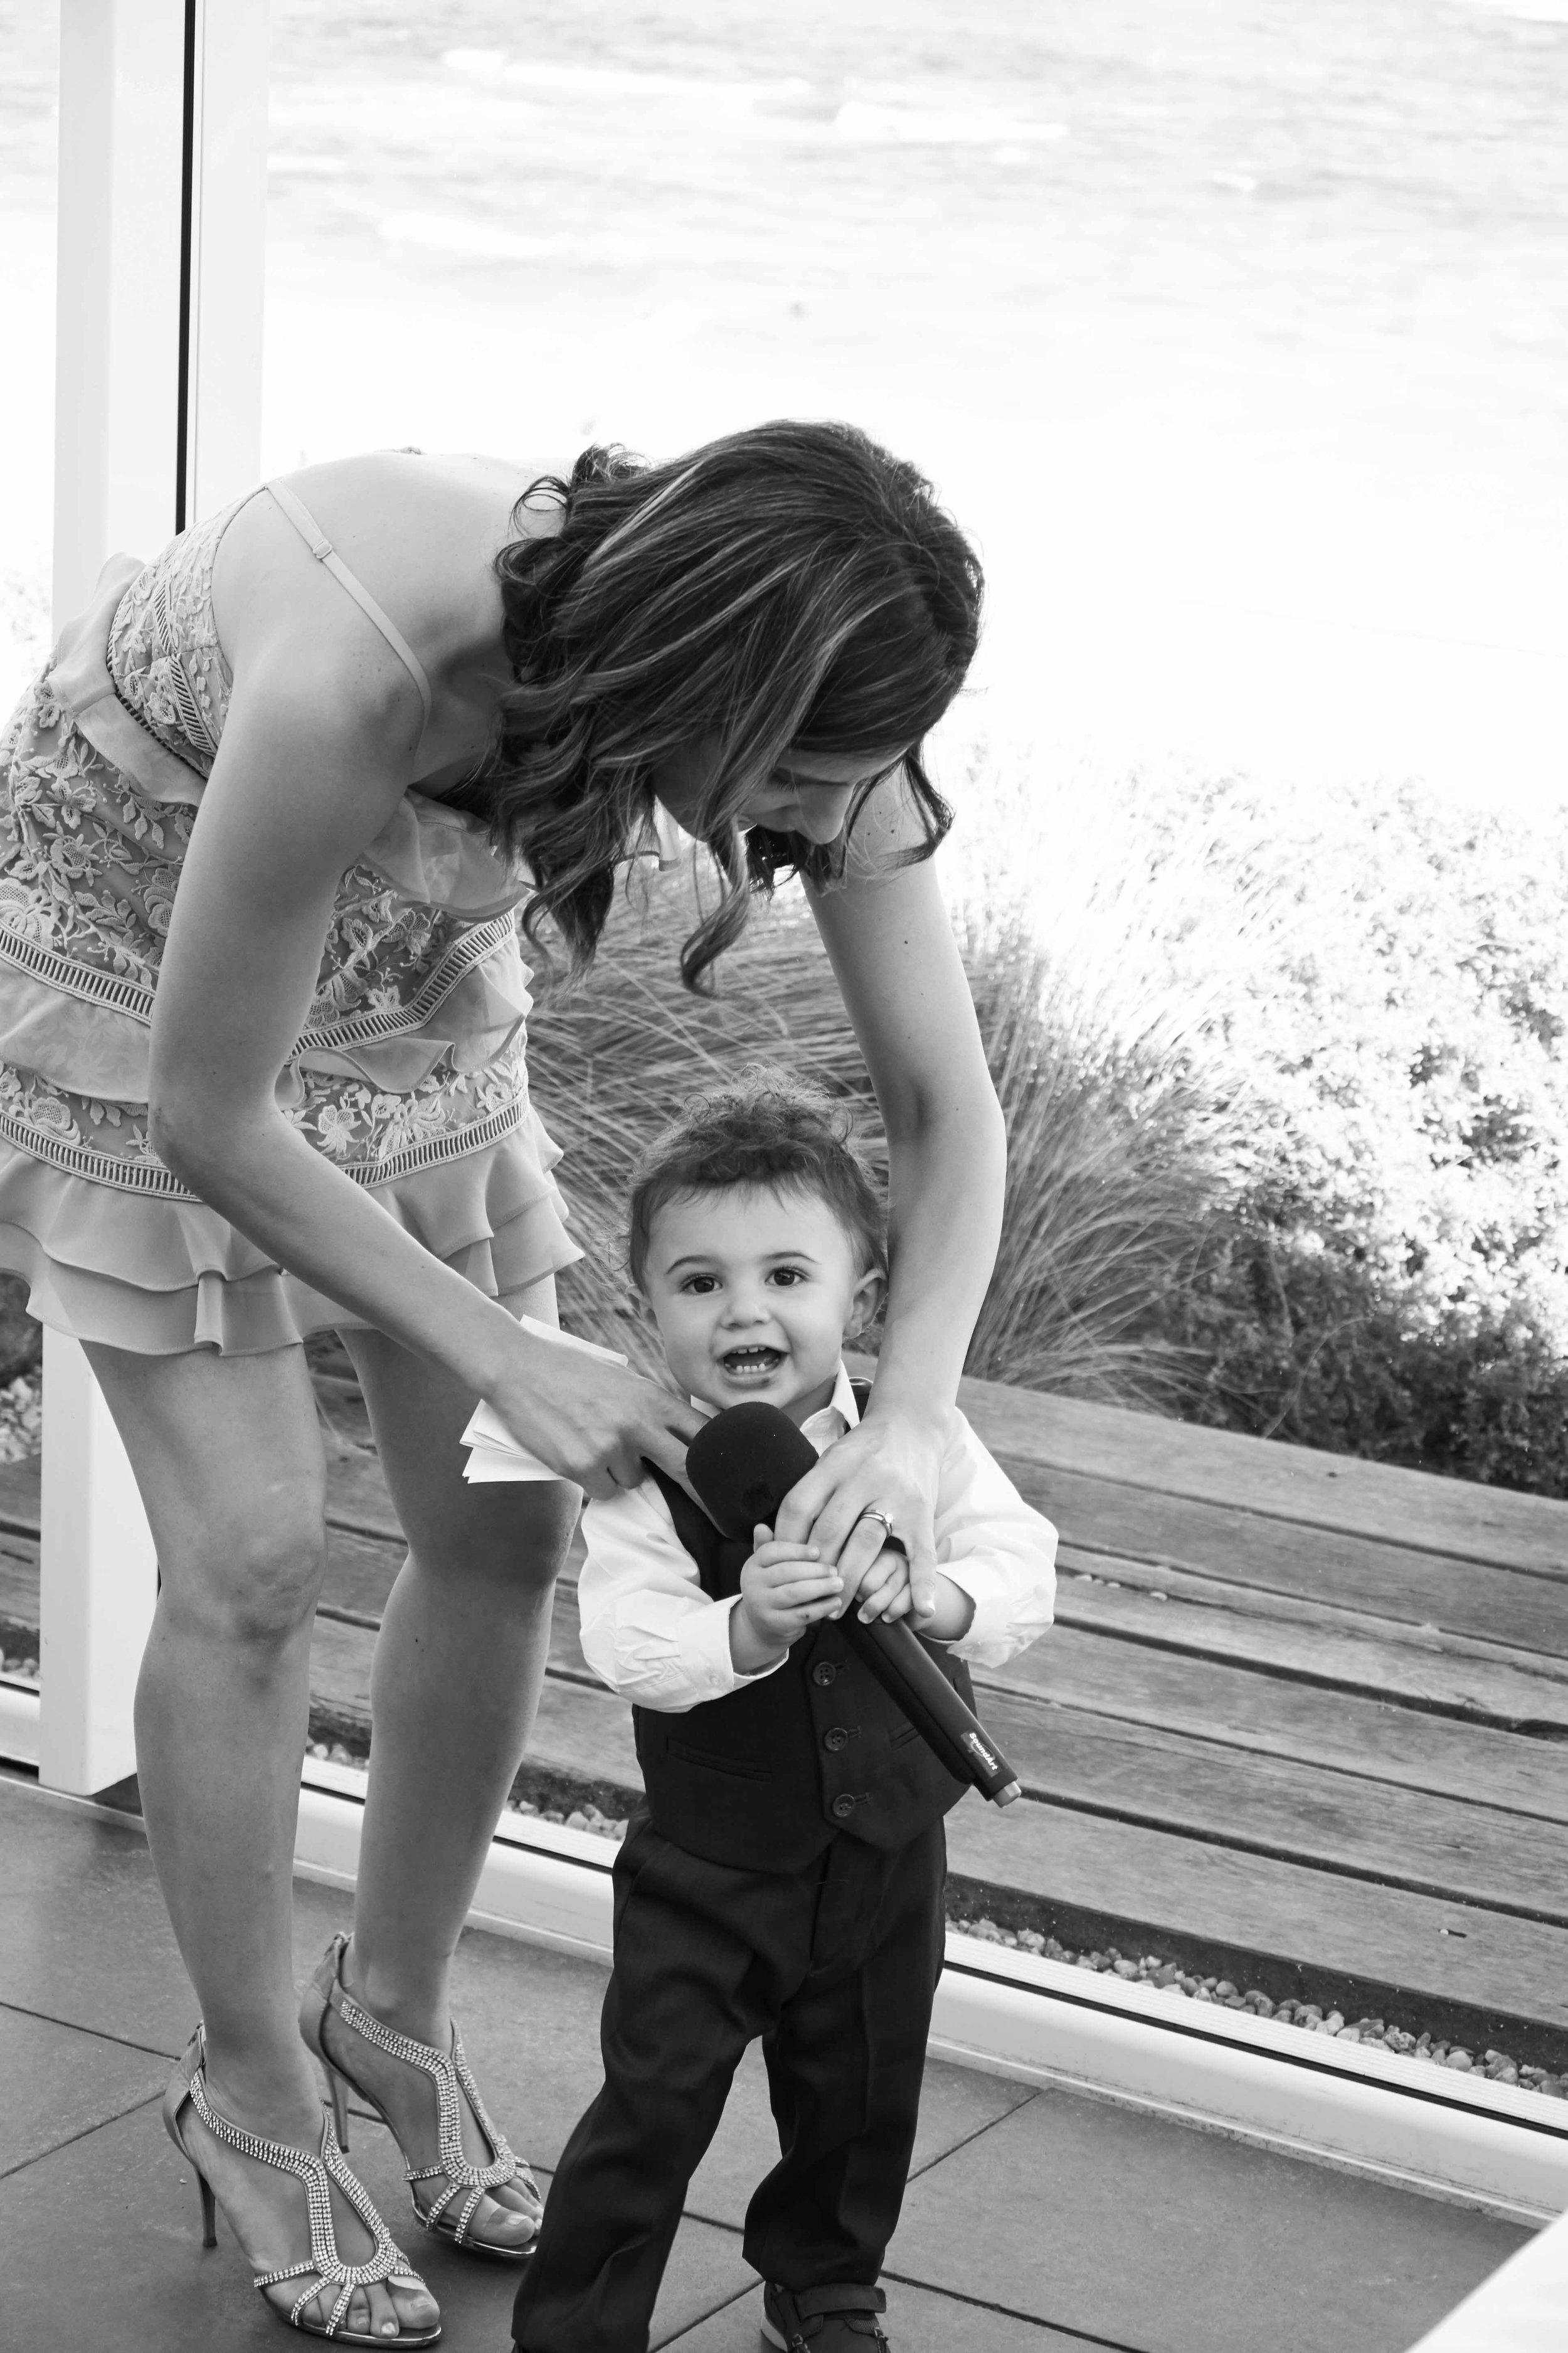 sorrento-wedding-photography-all-smiles-marissa-jade-photography-92.jpg